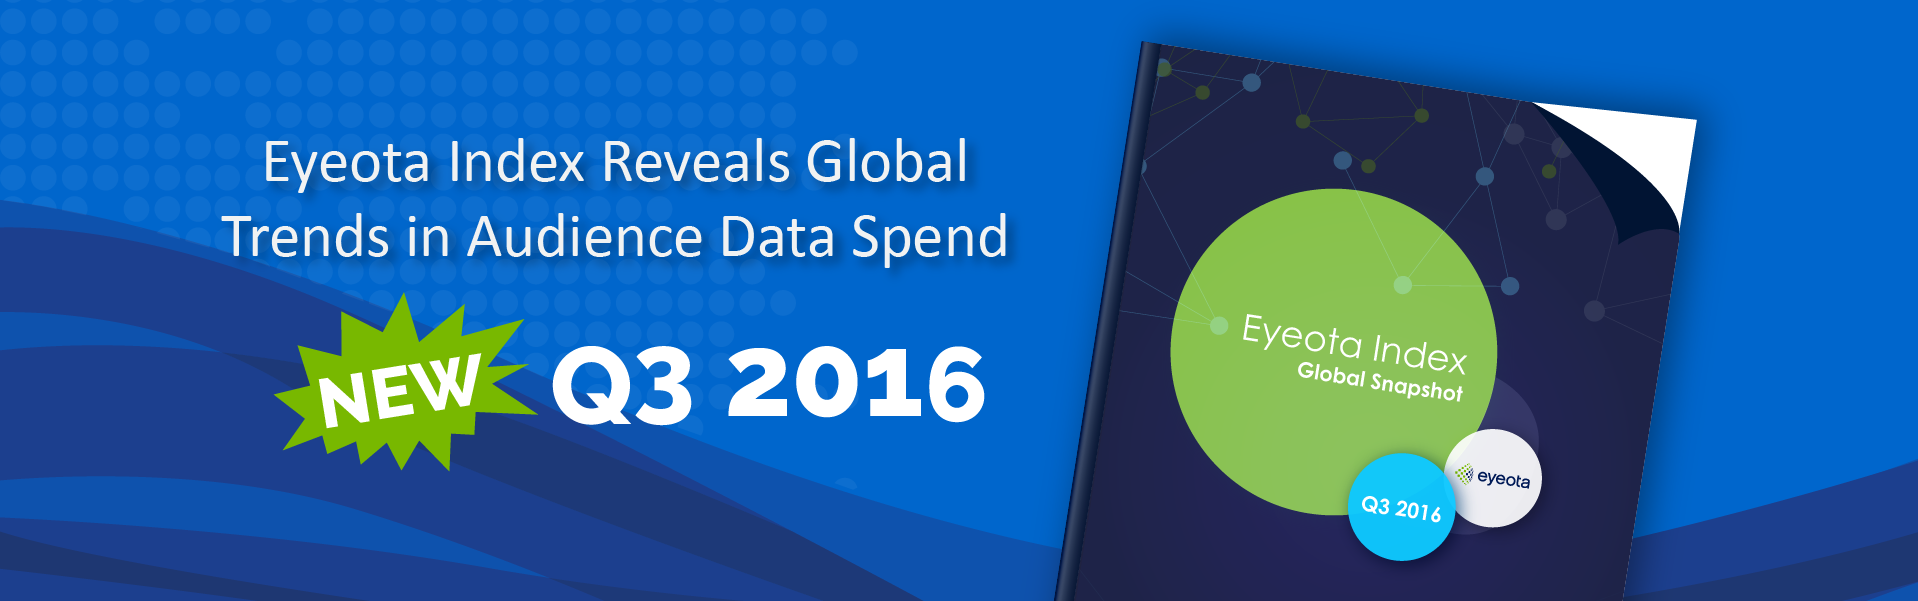 Eyeota Q3 2016 Index Report